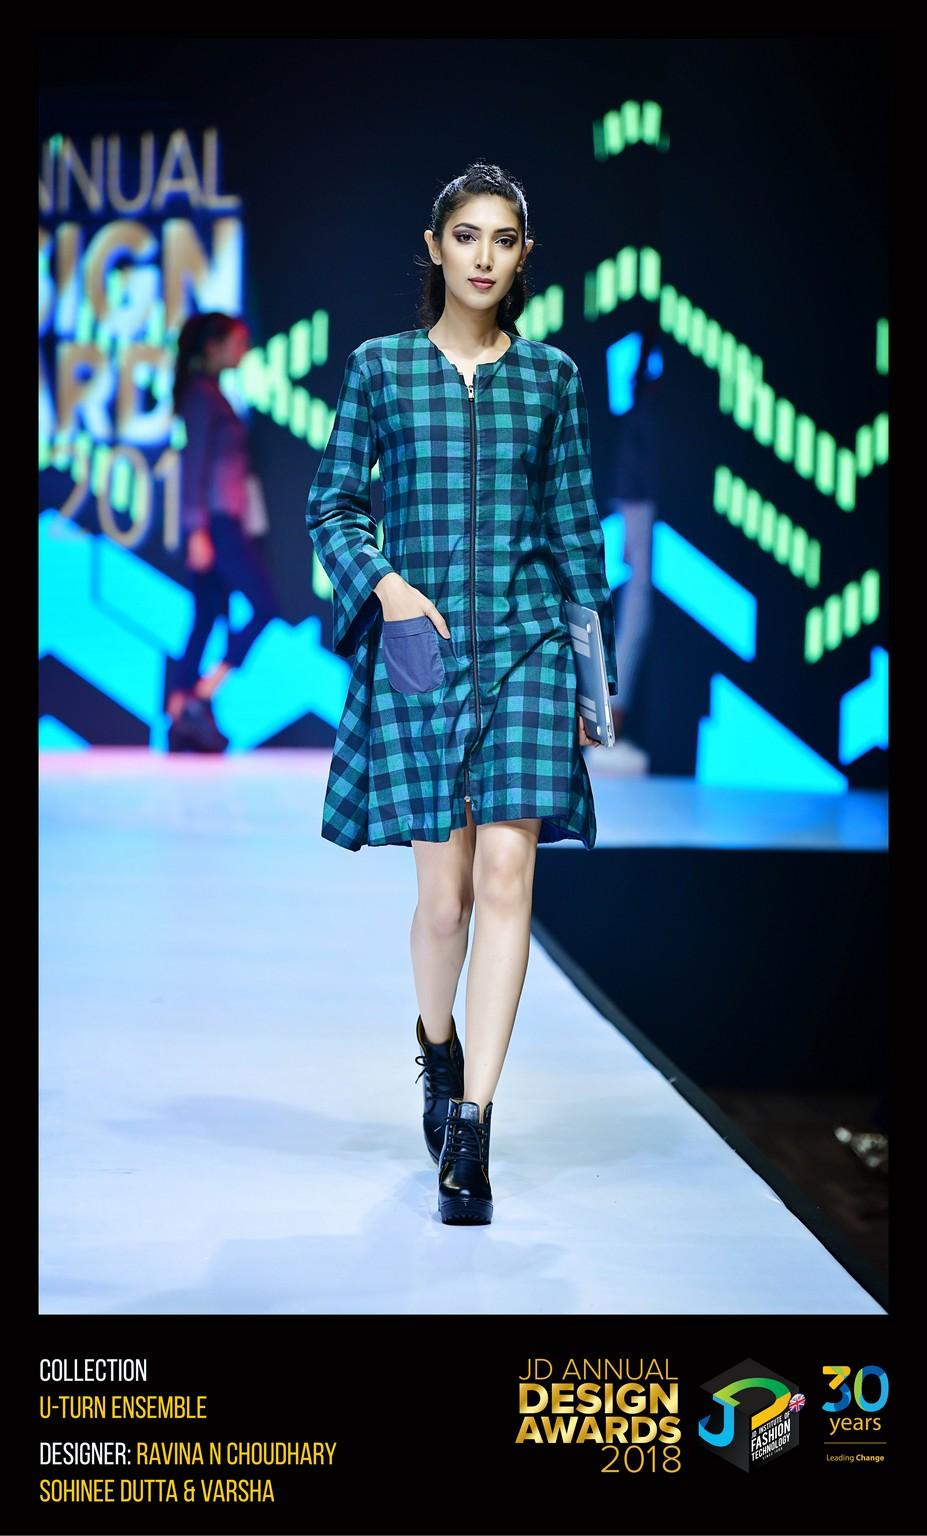 The U-turn ensemble – Change – JD Annual Design Awards 2018 | Designer: Sohinee, Ravina and Varsha | Photography : Jerin Nath (@jerin_nath) the u-turn ensemble - U TURN ENSEMBLE  - The U-turn ensemble – Change – JD Annual Design Awards 2018